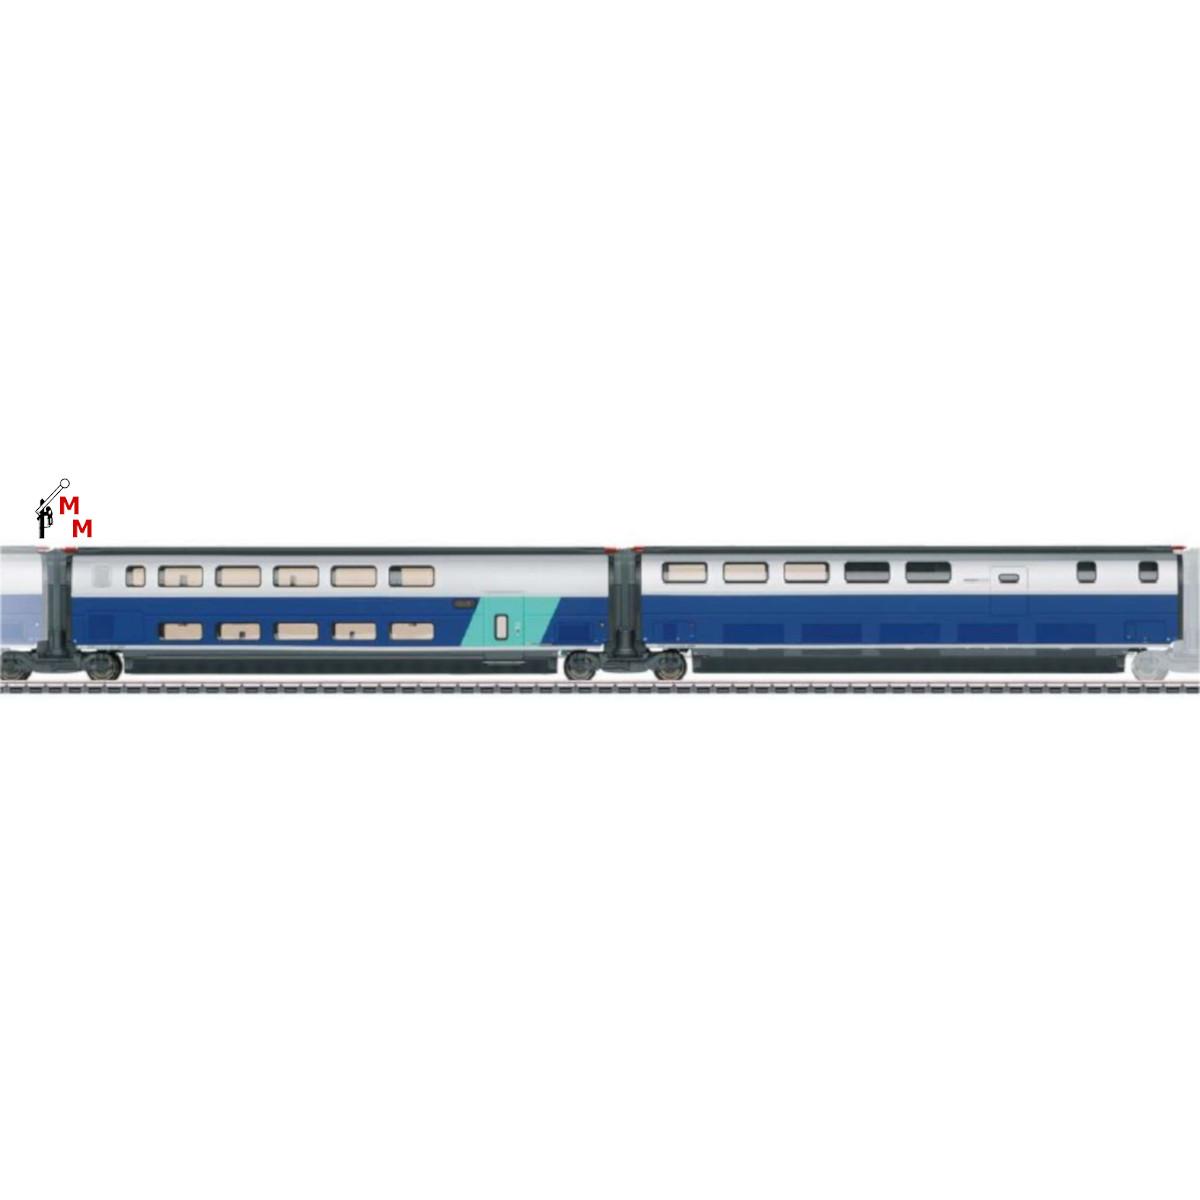 (Neu) Märklin 43443 Ergänzungswagen-Set -3- zum  TGV Duplex,